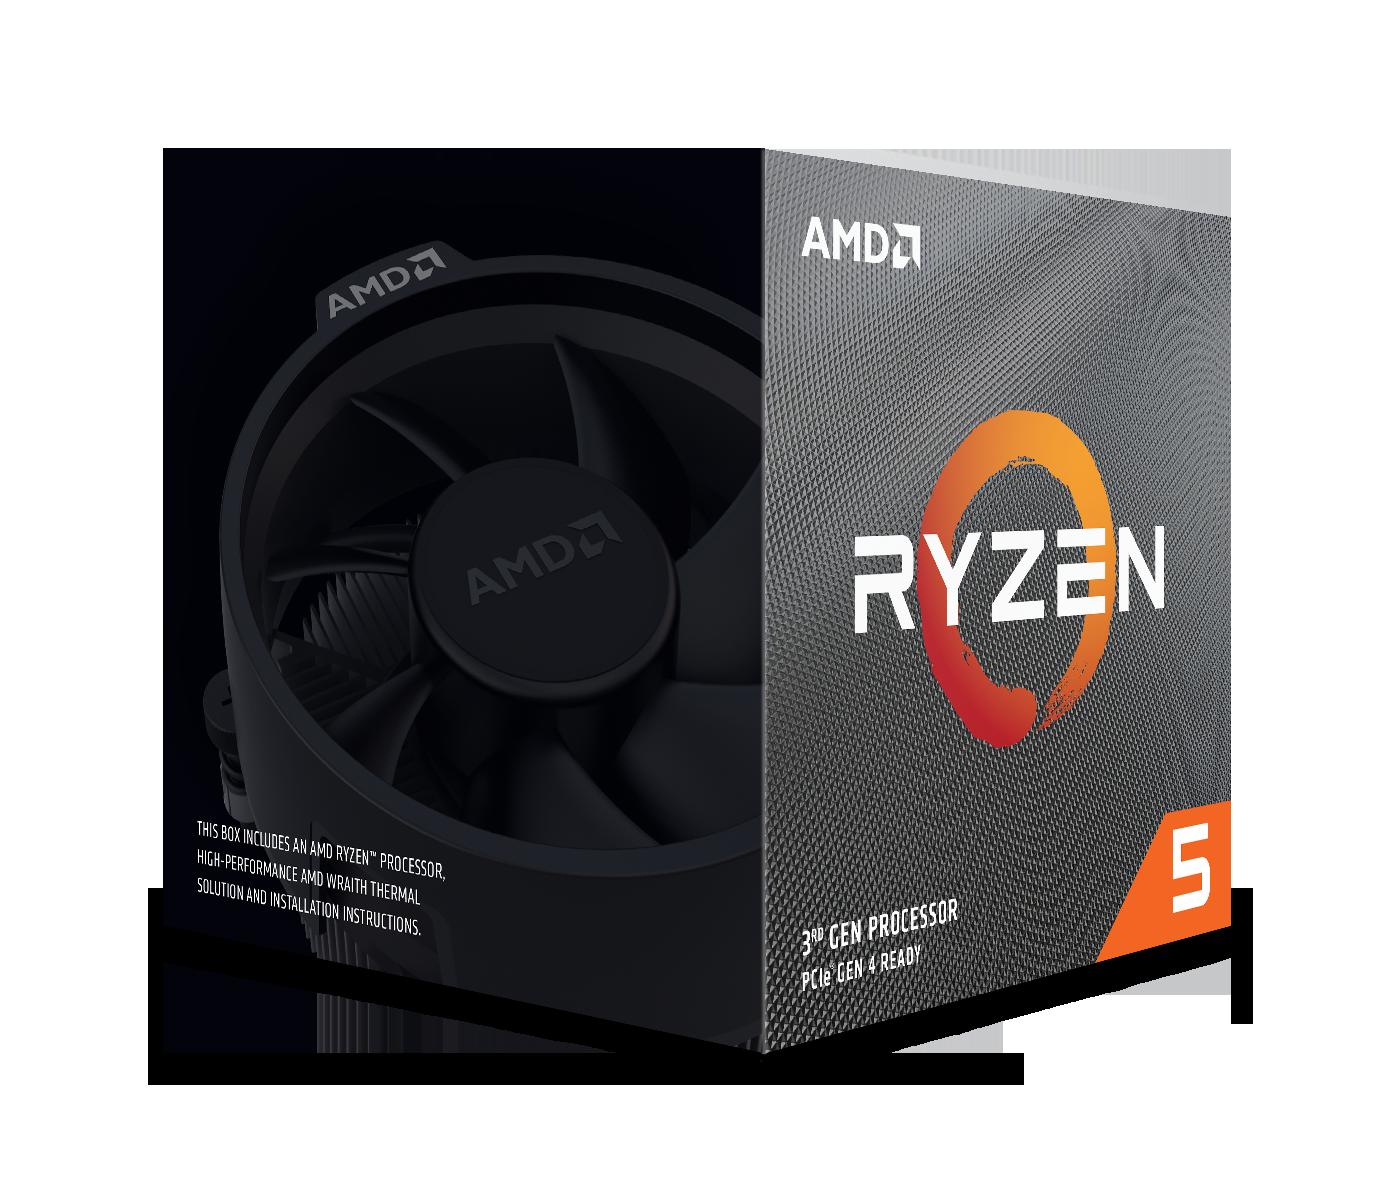 Processeur Ryzen 5 3600X Wraith Spire Edition AMD